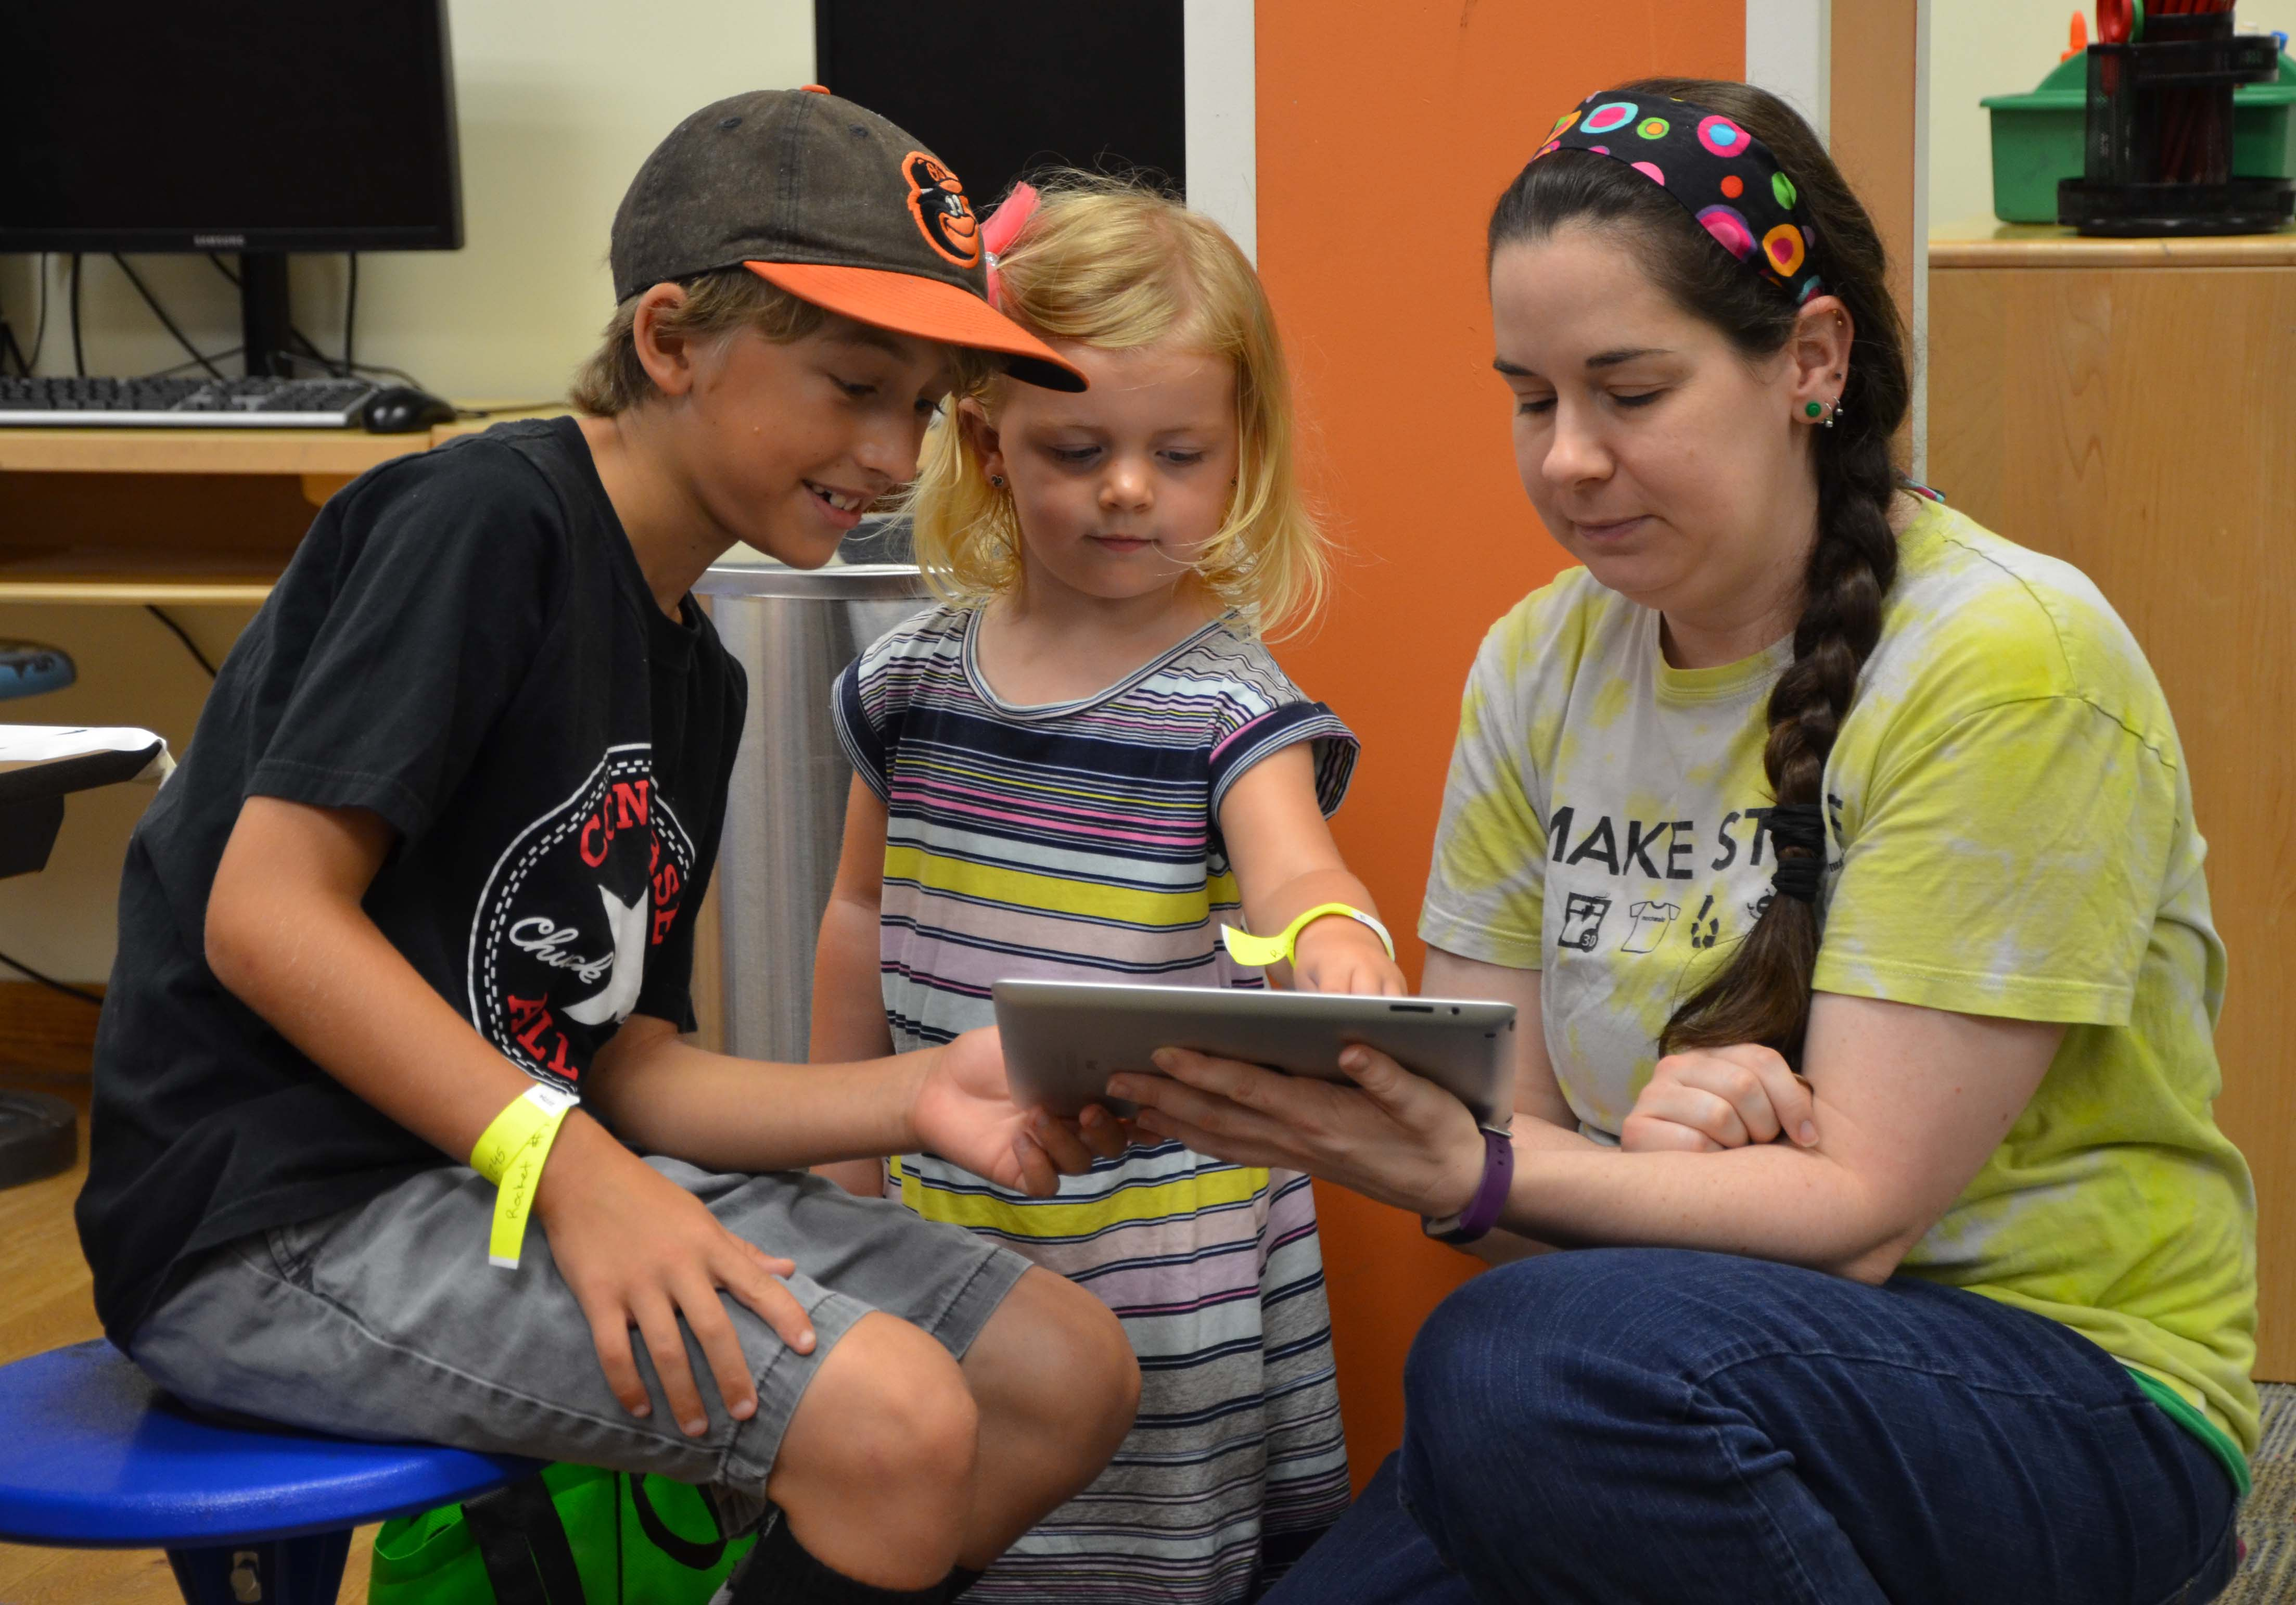 Children and Teacher Tablet